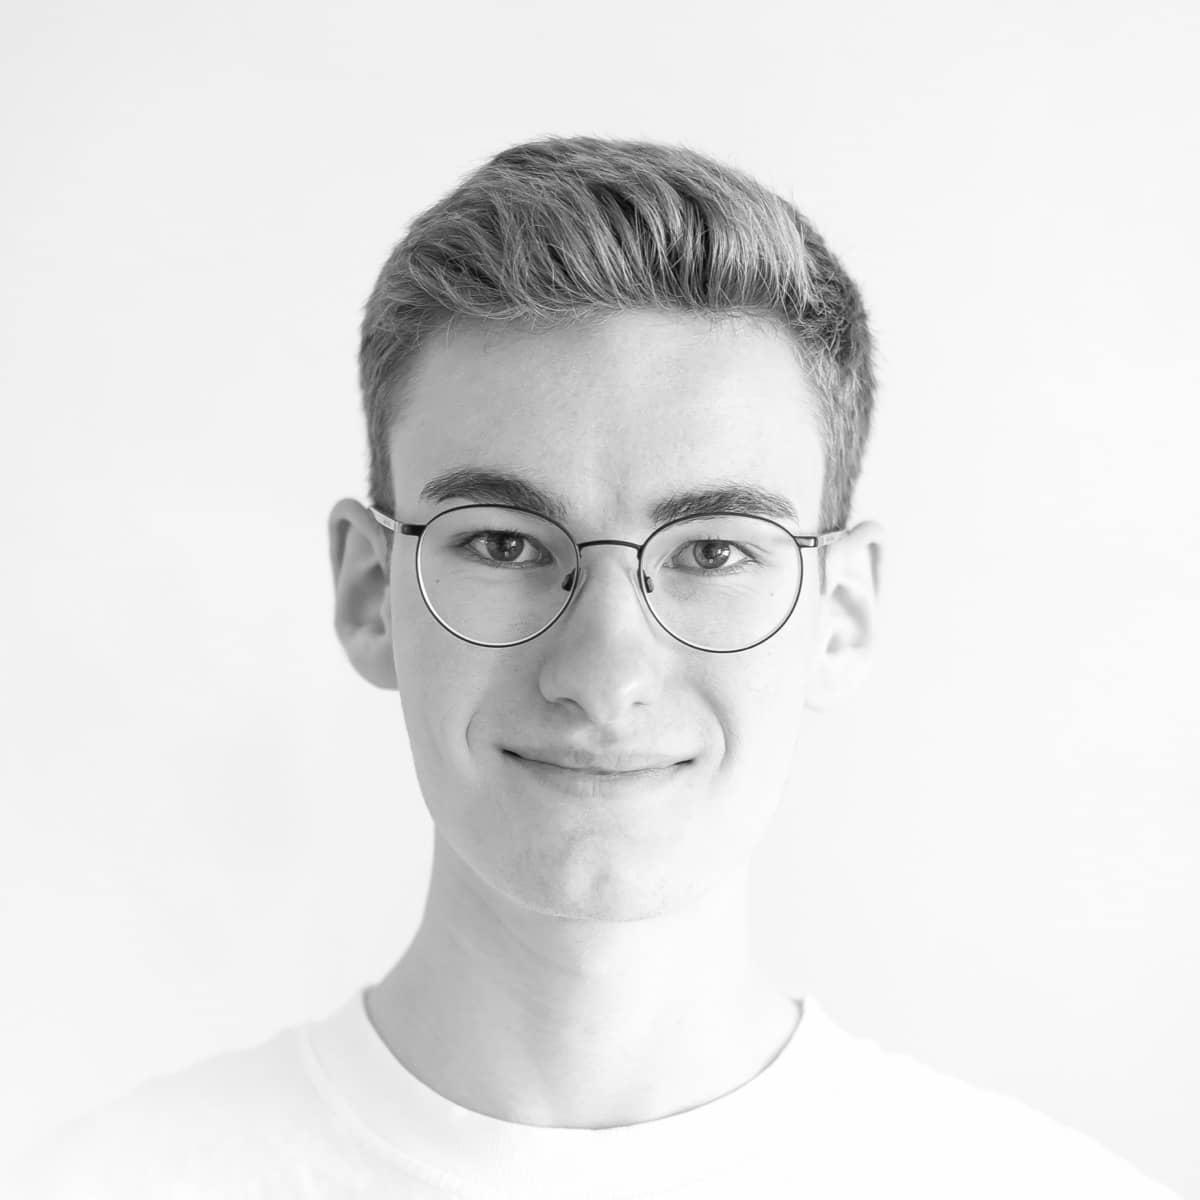 Portraitfoto von Moritz Petersen, dem Webflow Experten